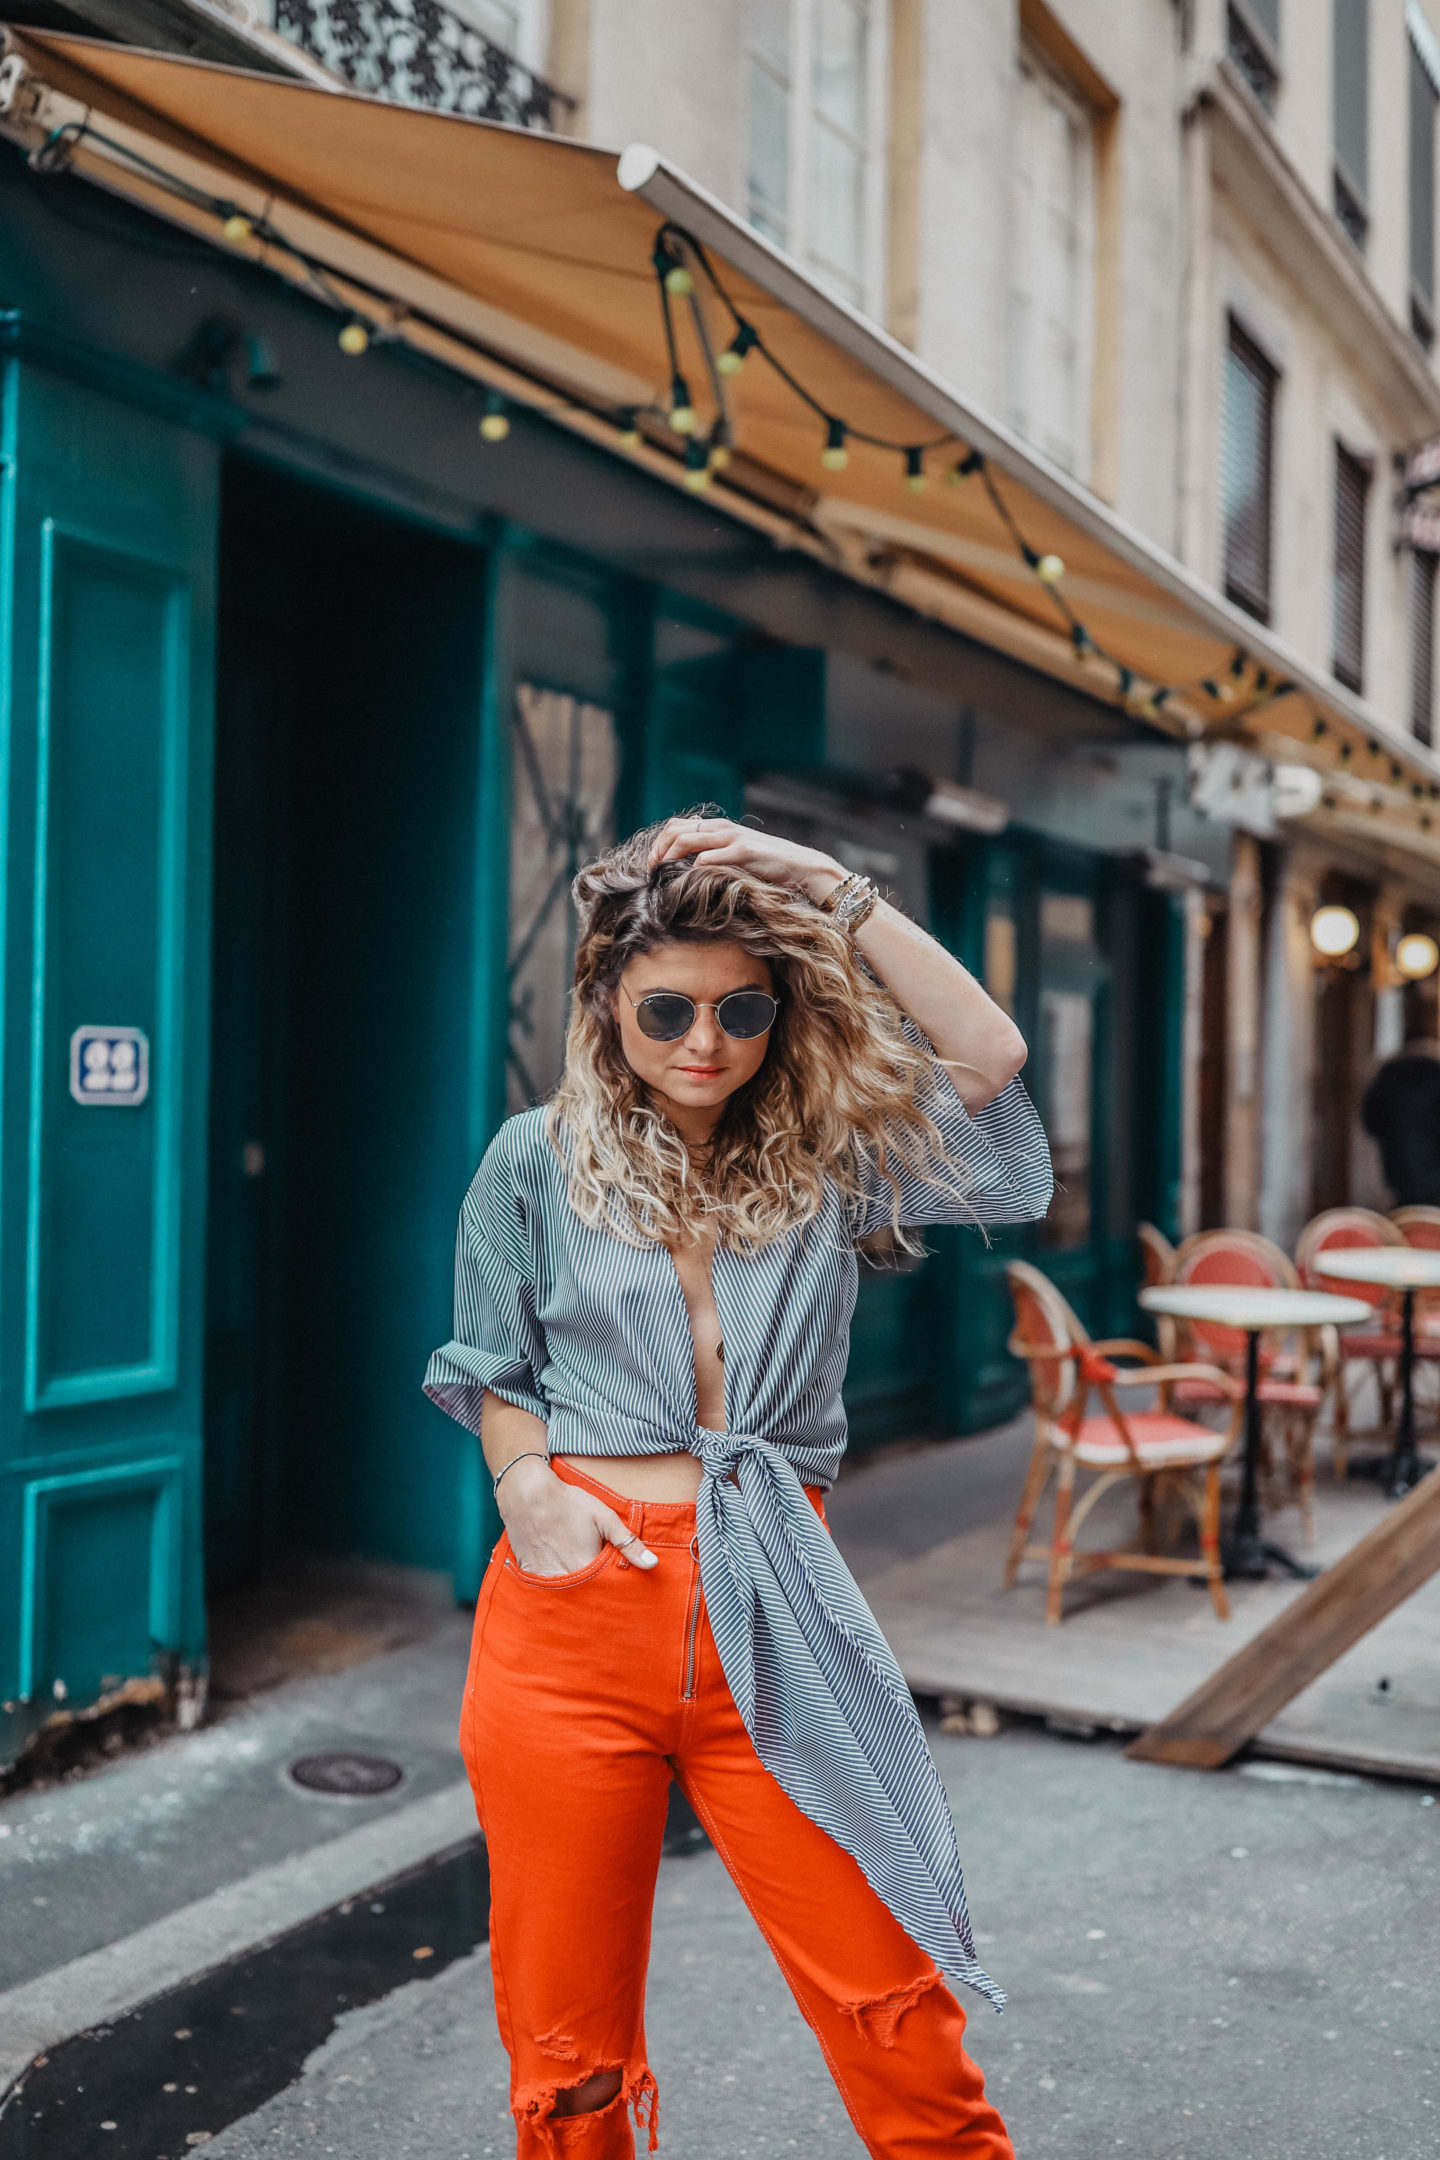 combinaison crop top et jean taille haute marie and mood